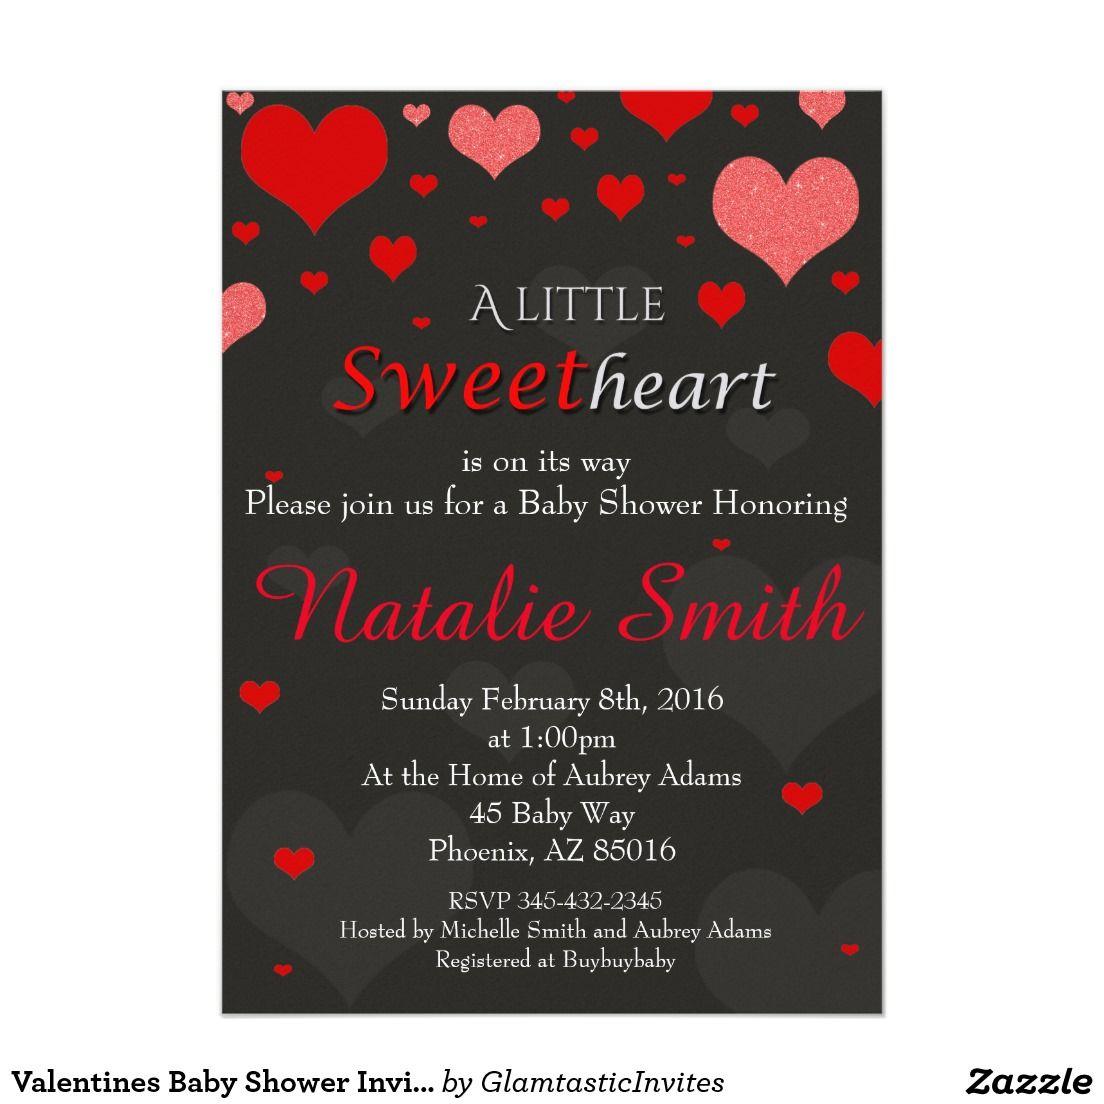 Valentines Baby Shower Invitation, Sweetheart Card | Shower ...